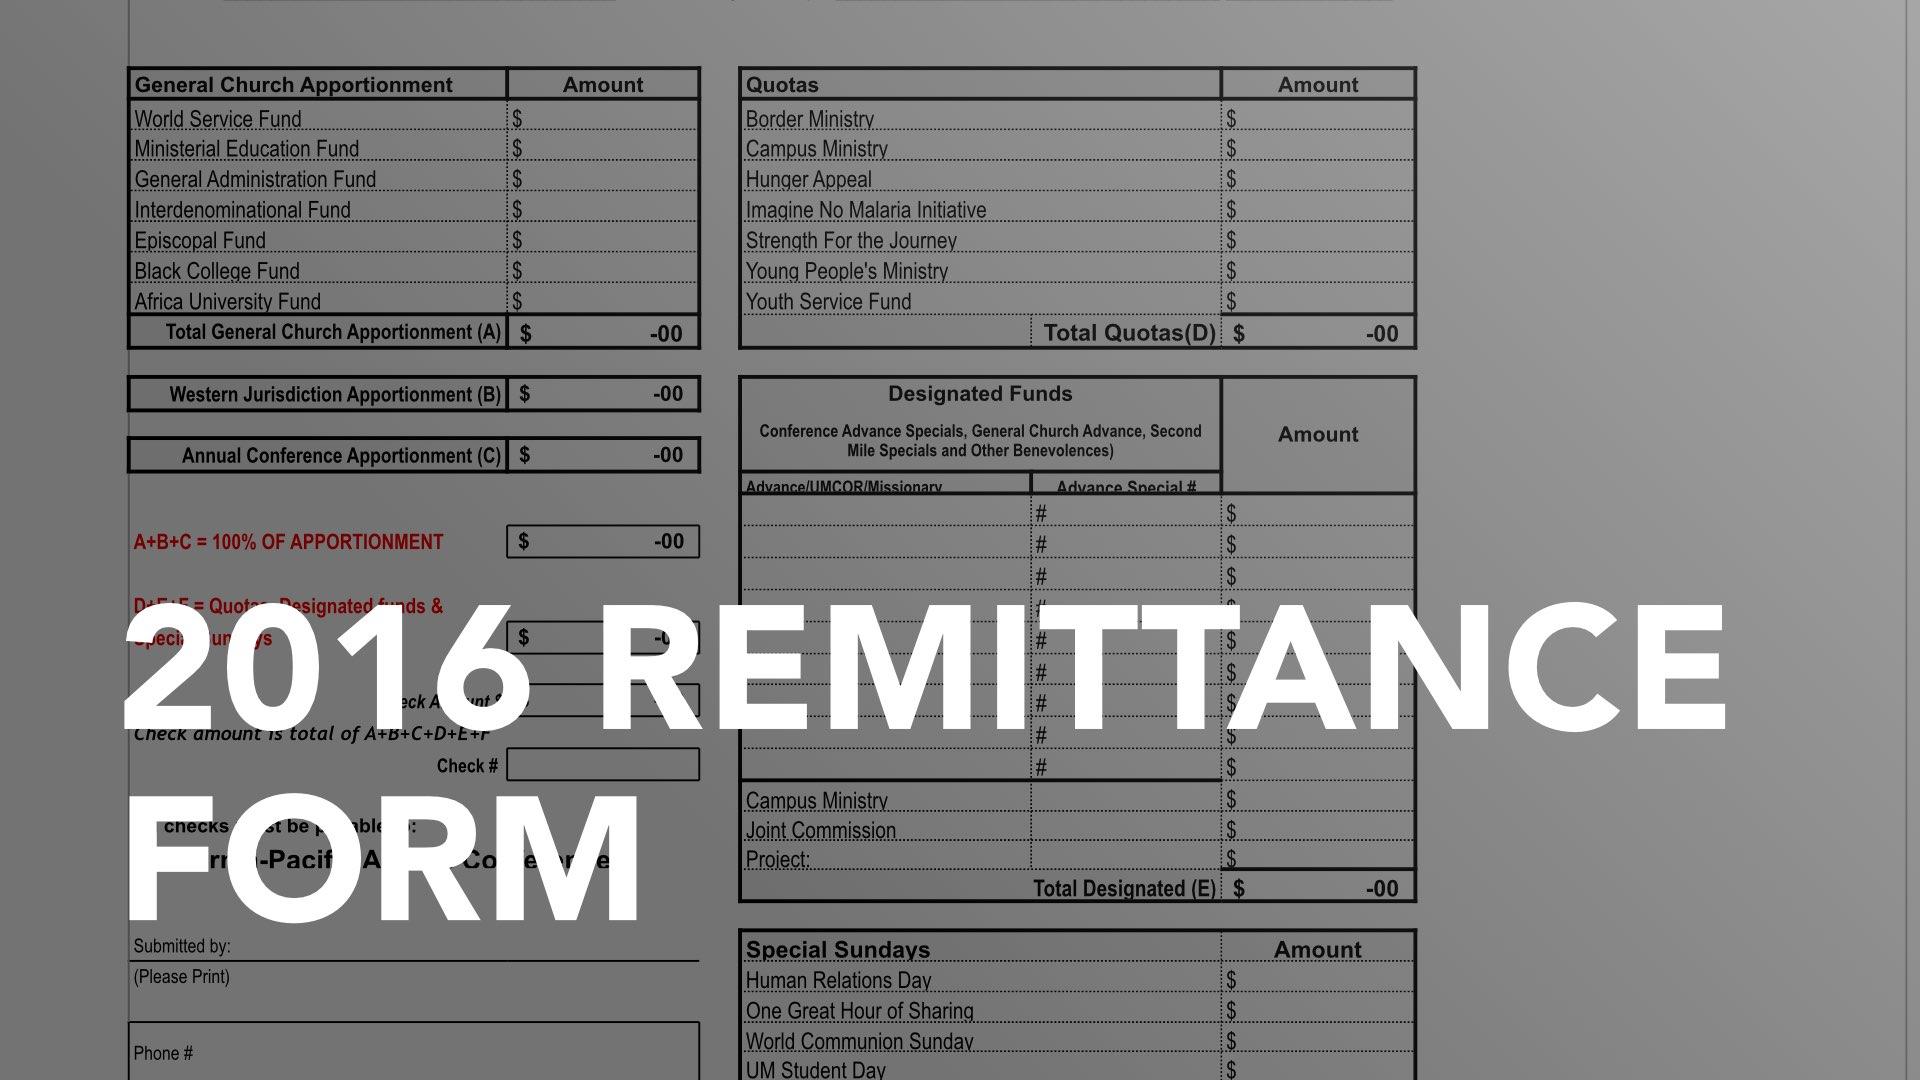 2016-remittance-form